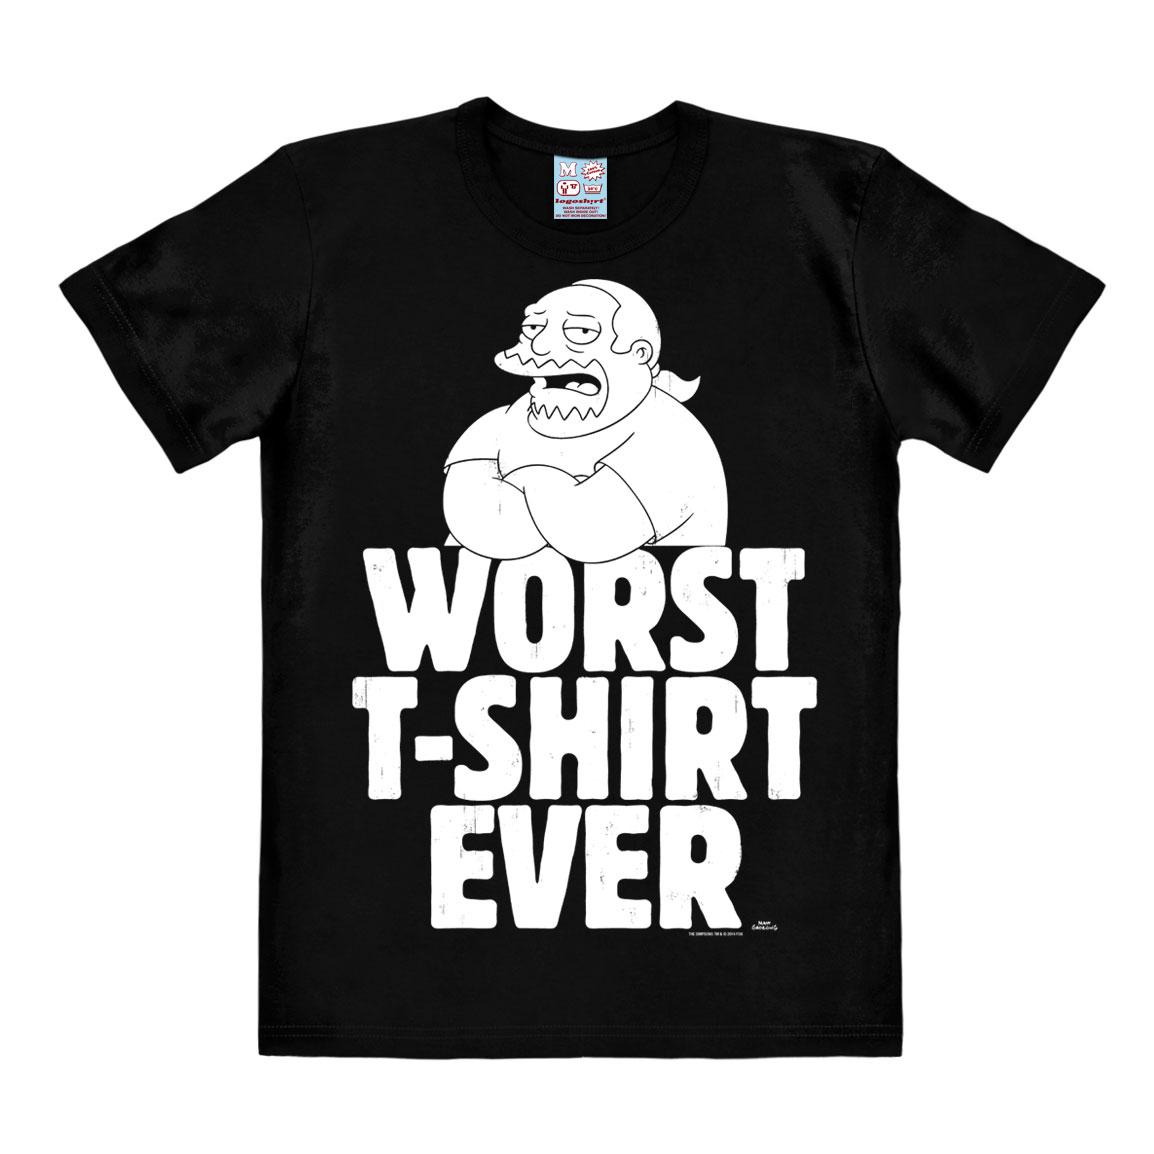 Simpsons T-Shirt Worst T-Shirt Ever Size L